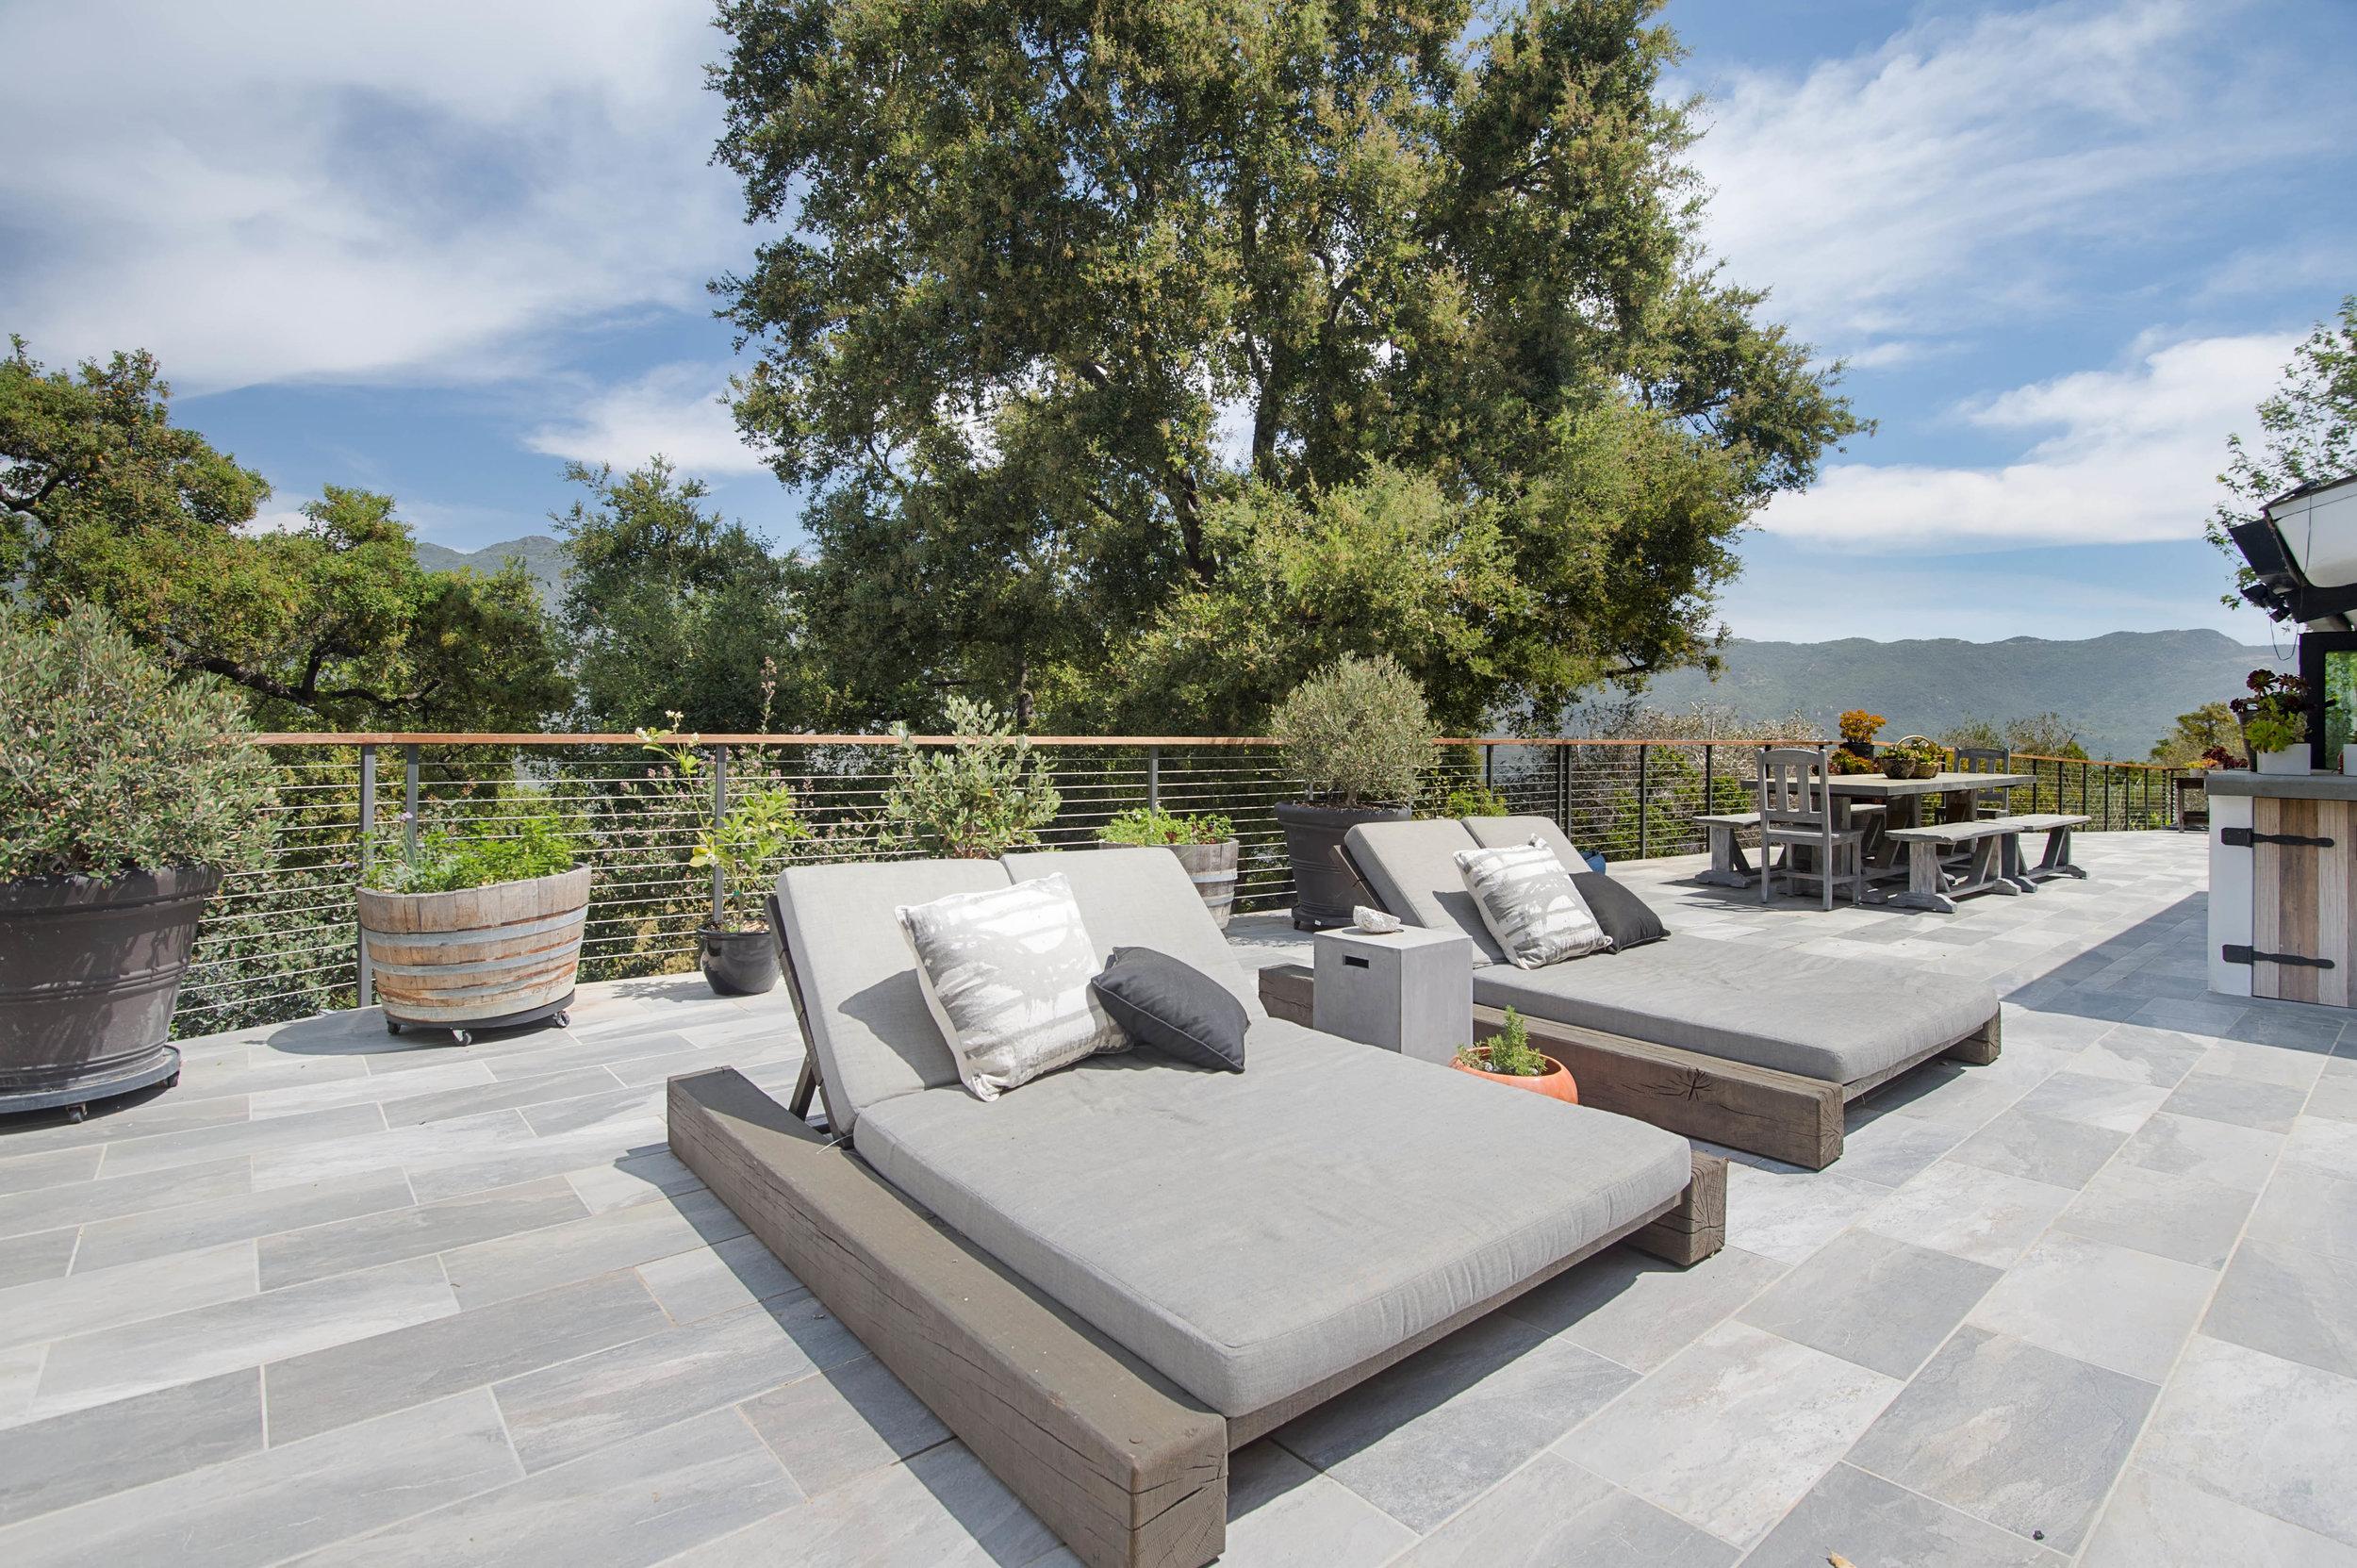 030 Pool 26272 Cool Glen Way Malibu For Sale Luxury Real Estate.jpg